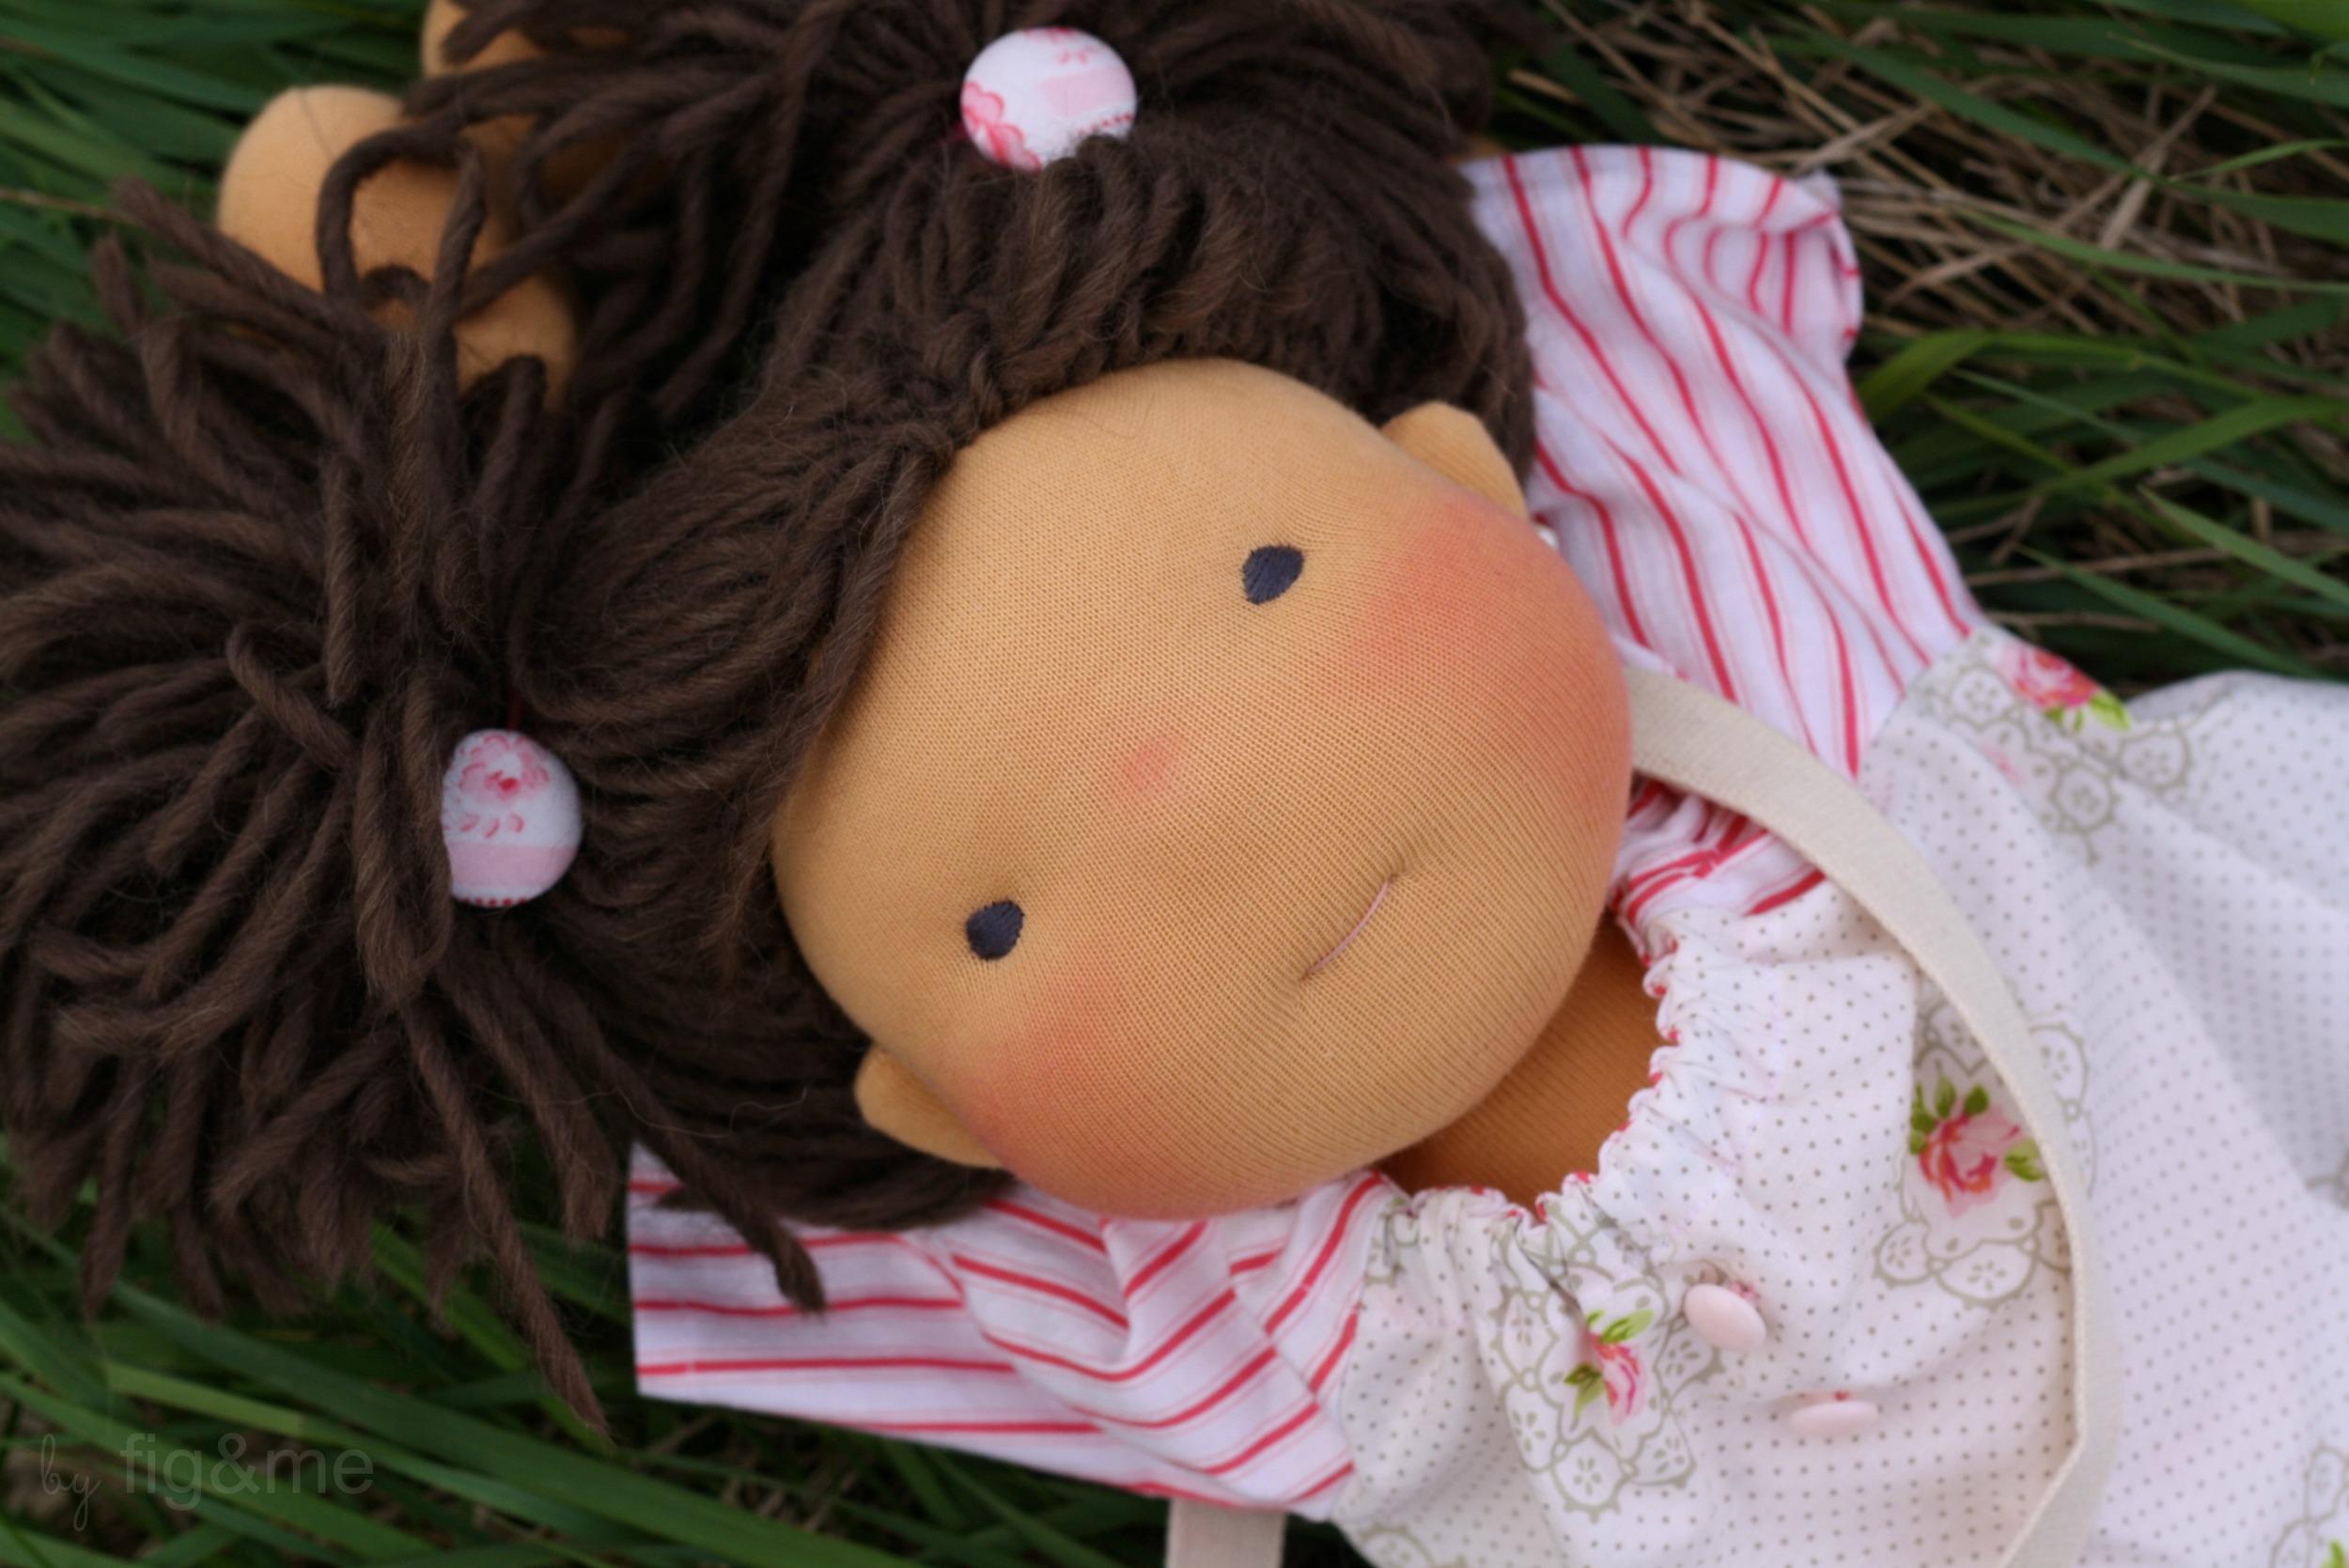 A doll wearing handmade hair elastics, by Figandme.